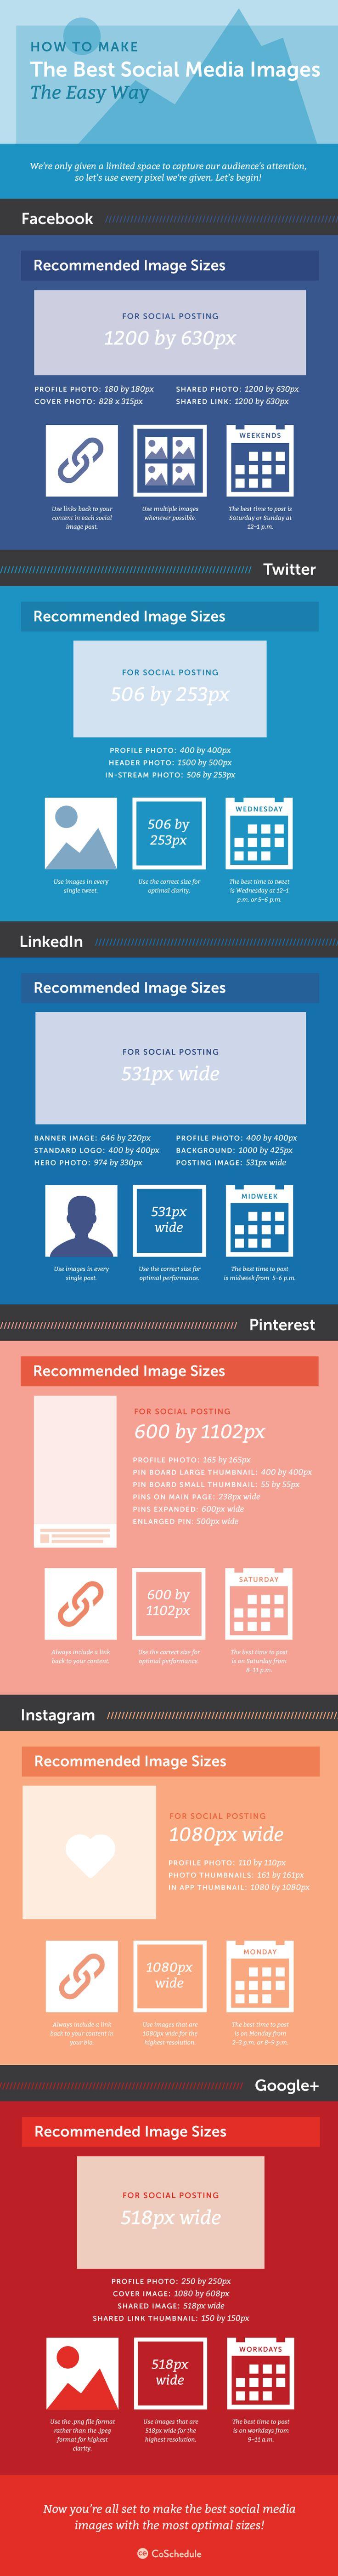 Get Your Free Social Media Images Bundle! http://coschedule.com/blog/social-media-images/?utm_campaign=coschedule&utm_source=pinterest&utm_medium=CoSchedule&utm_content=Social%20Media%20Images%3A%20How%20To%20Make%20Them%20%28%2B70%20Free%20Photos%29